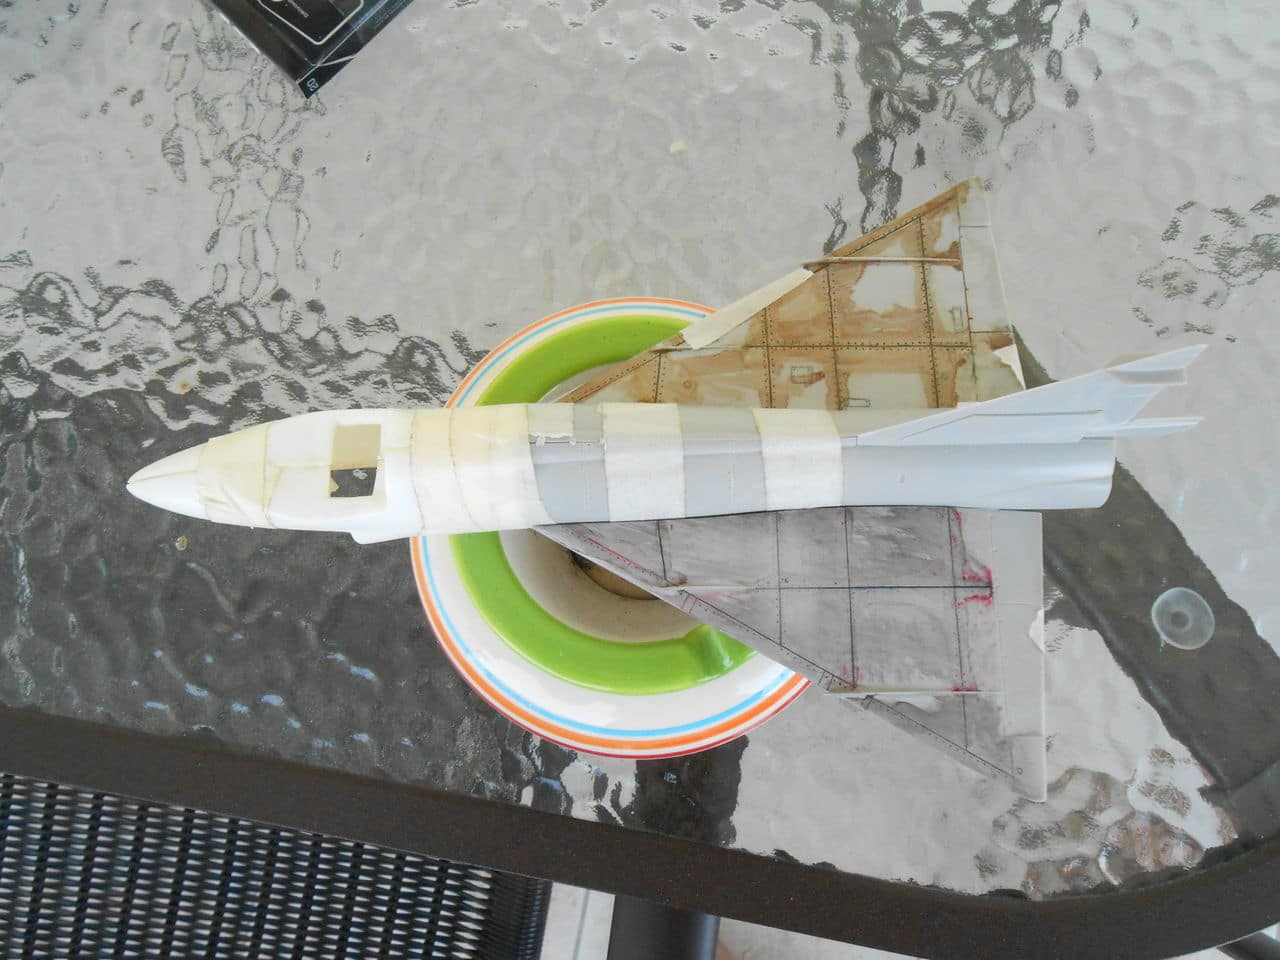 TF-102A delta dagger HAF DSCN1098